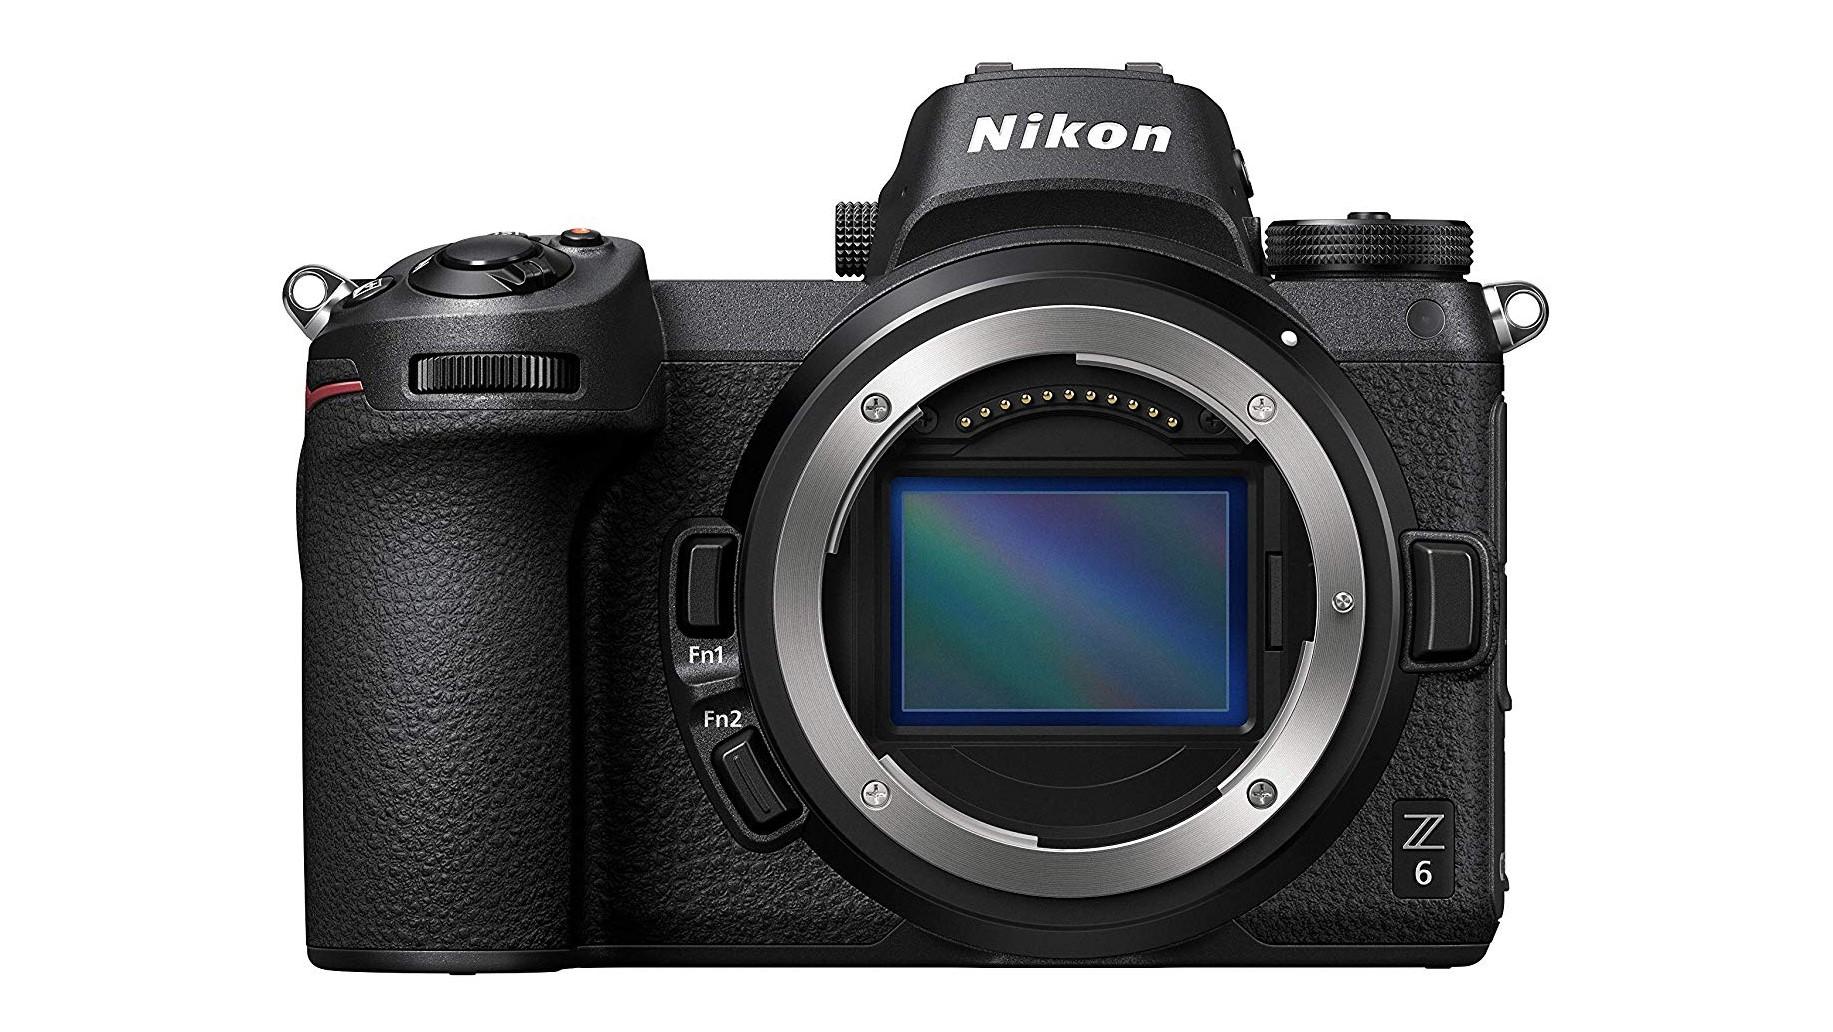 Nikon Z6 mirrorless camera body with no lens